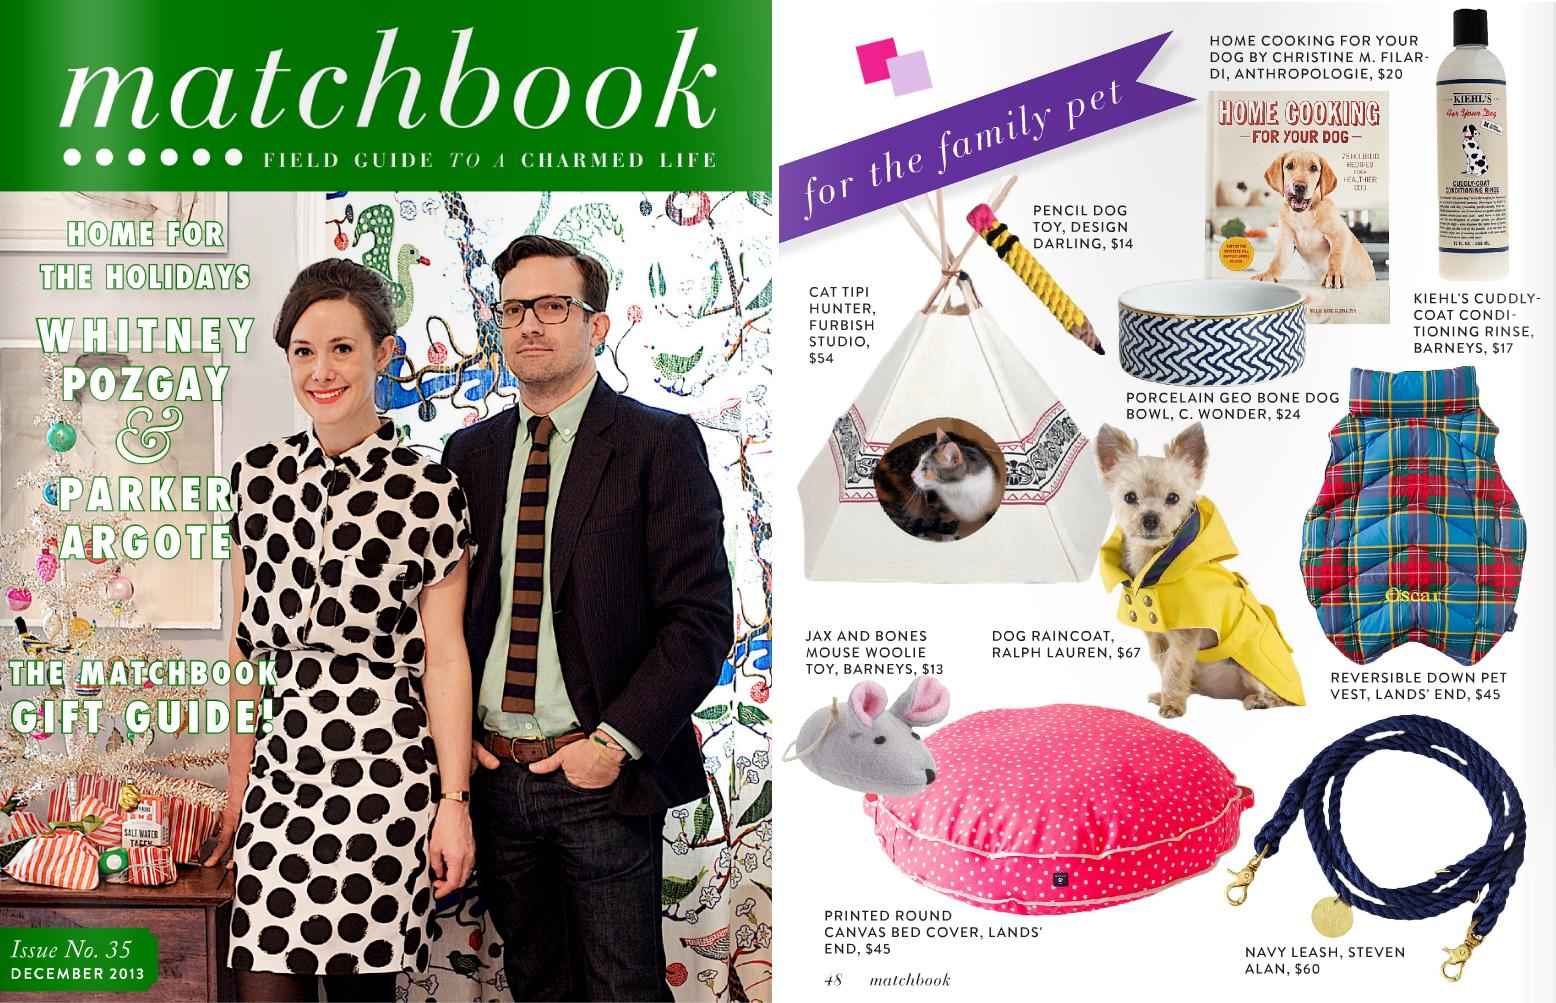 Matchbook Magazine December 2013 Funny Rope Dog Toy